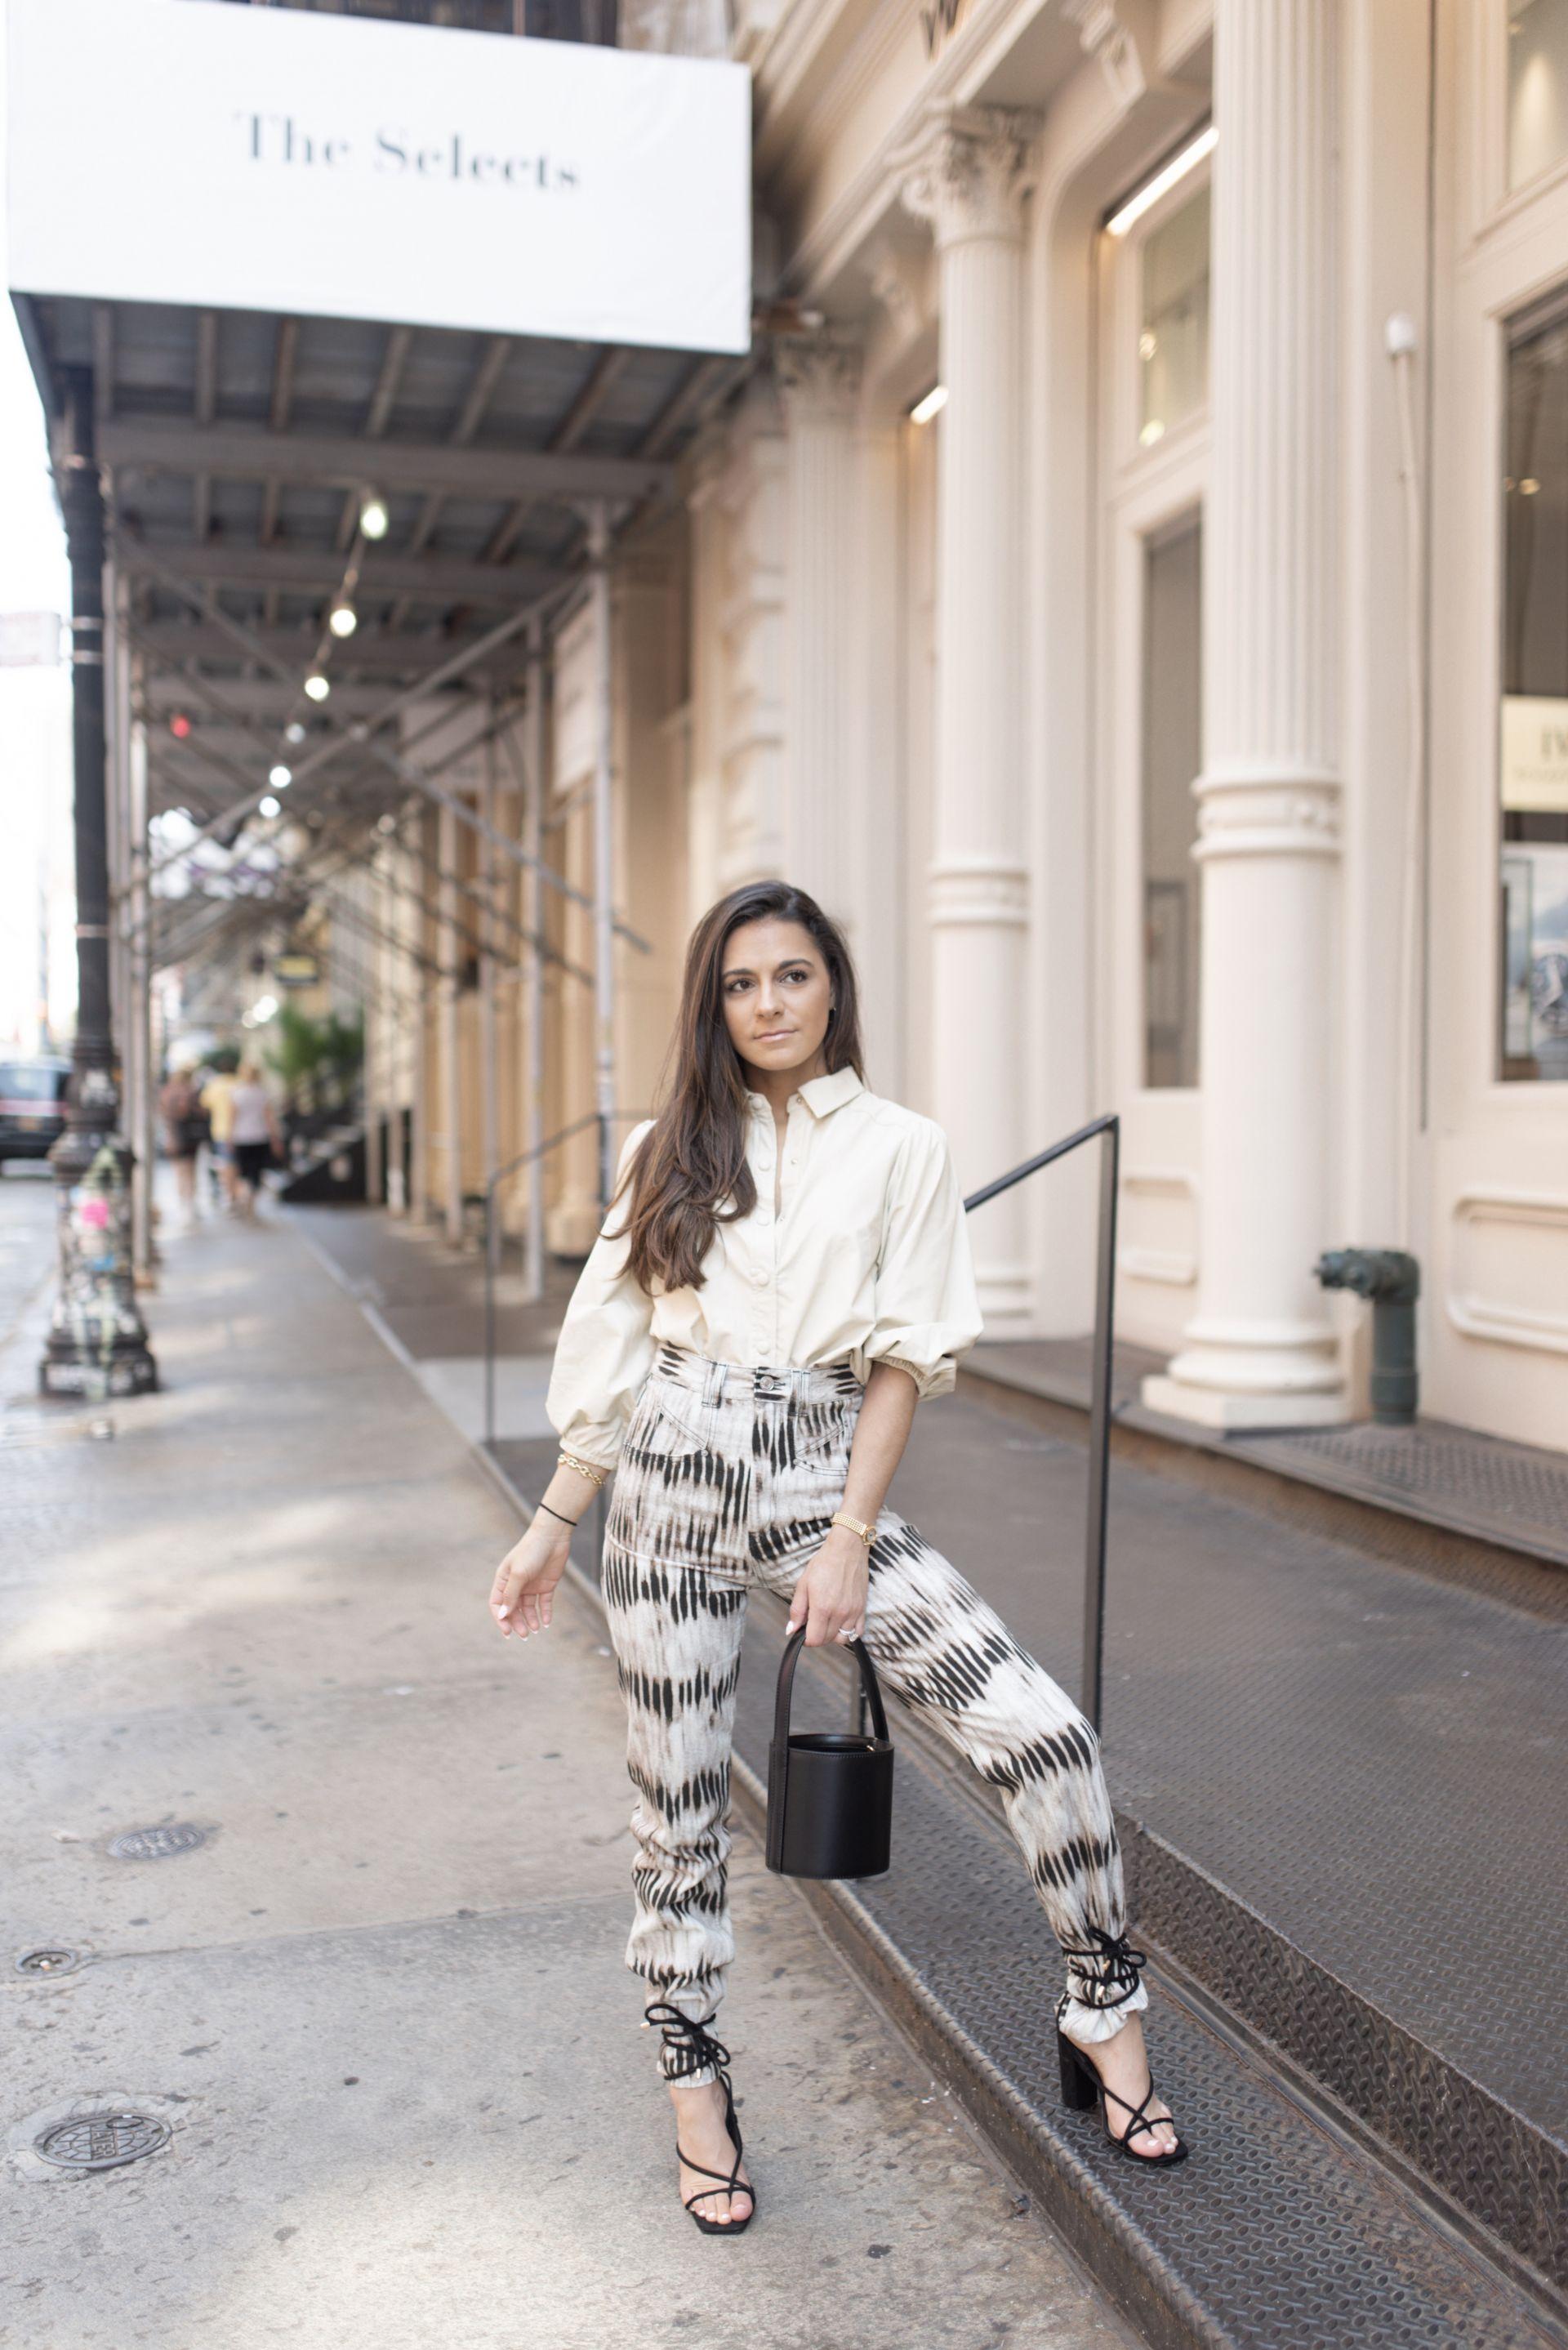 NYC Street Style Photoshoot